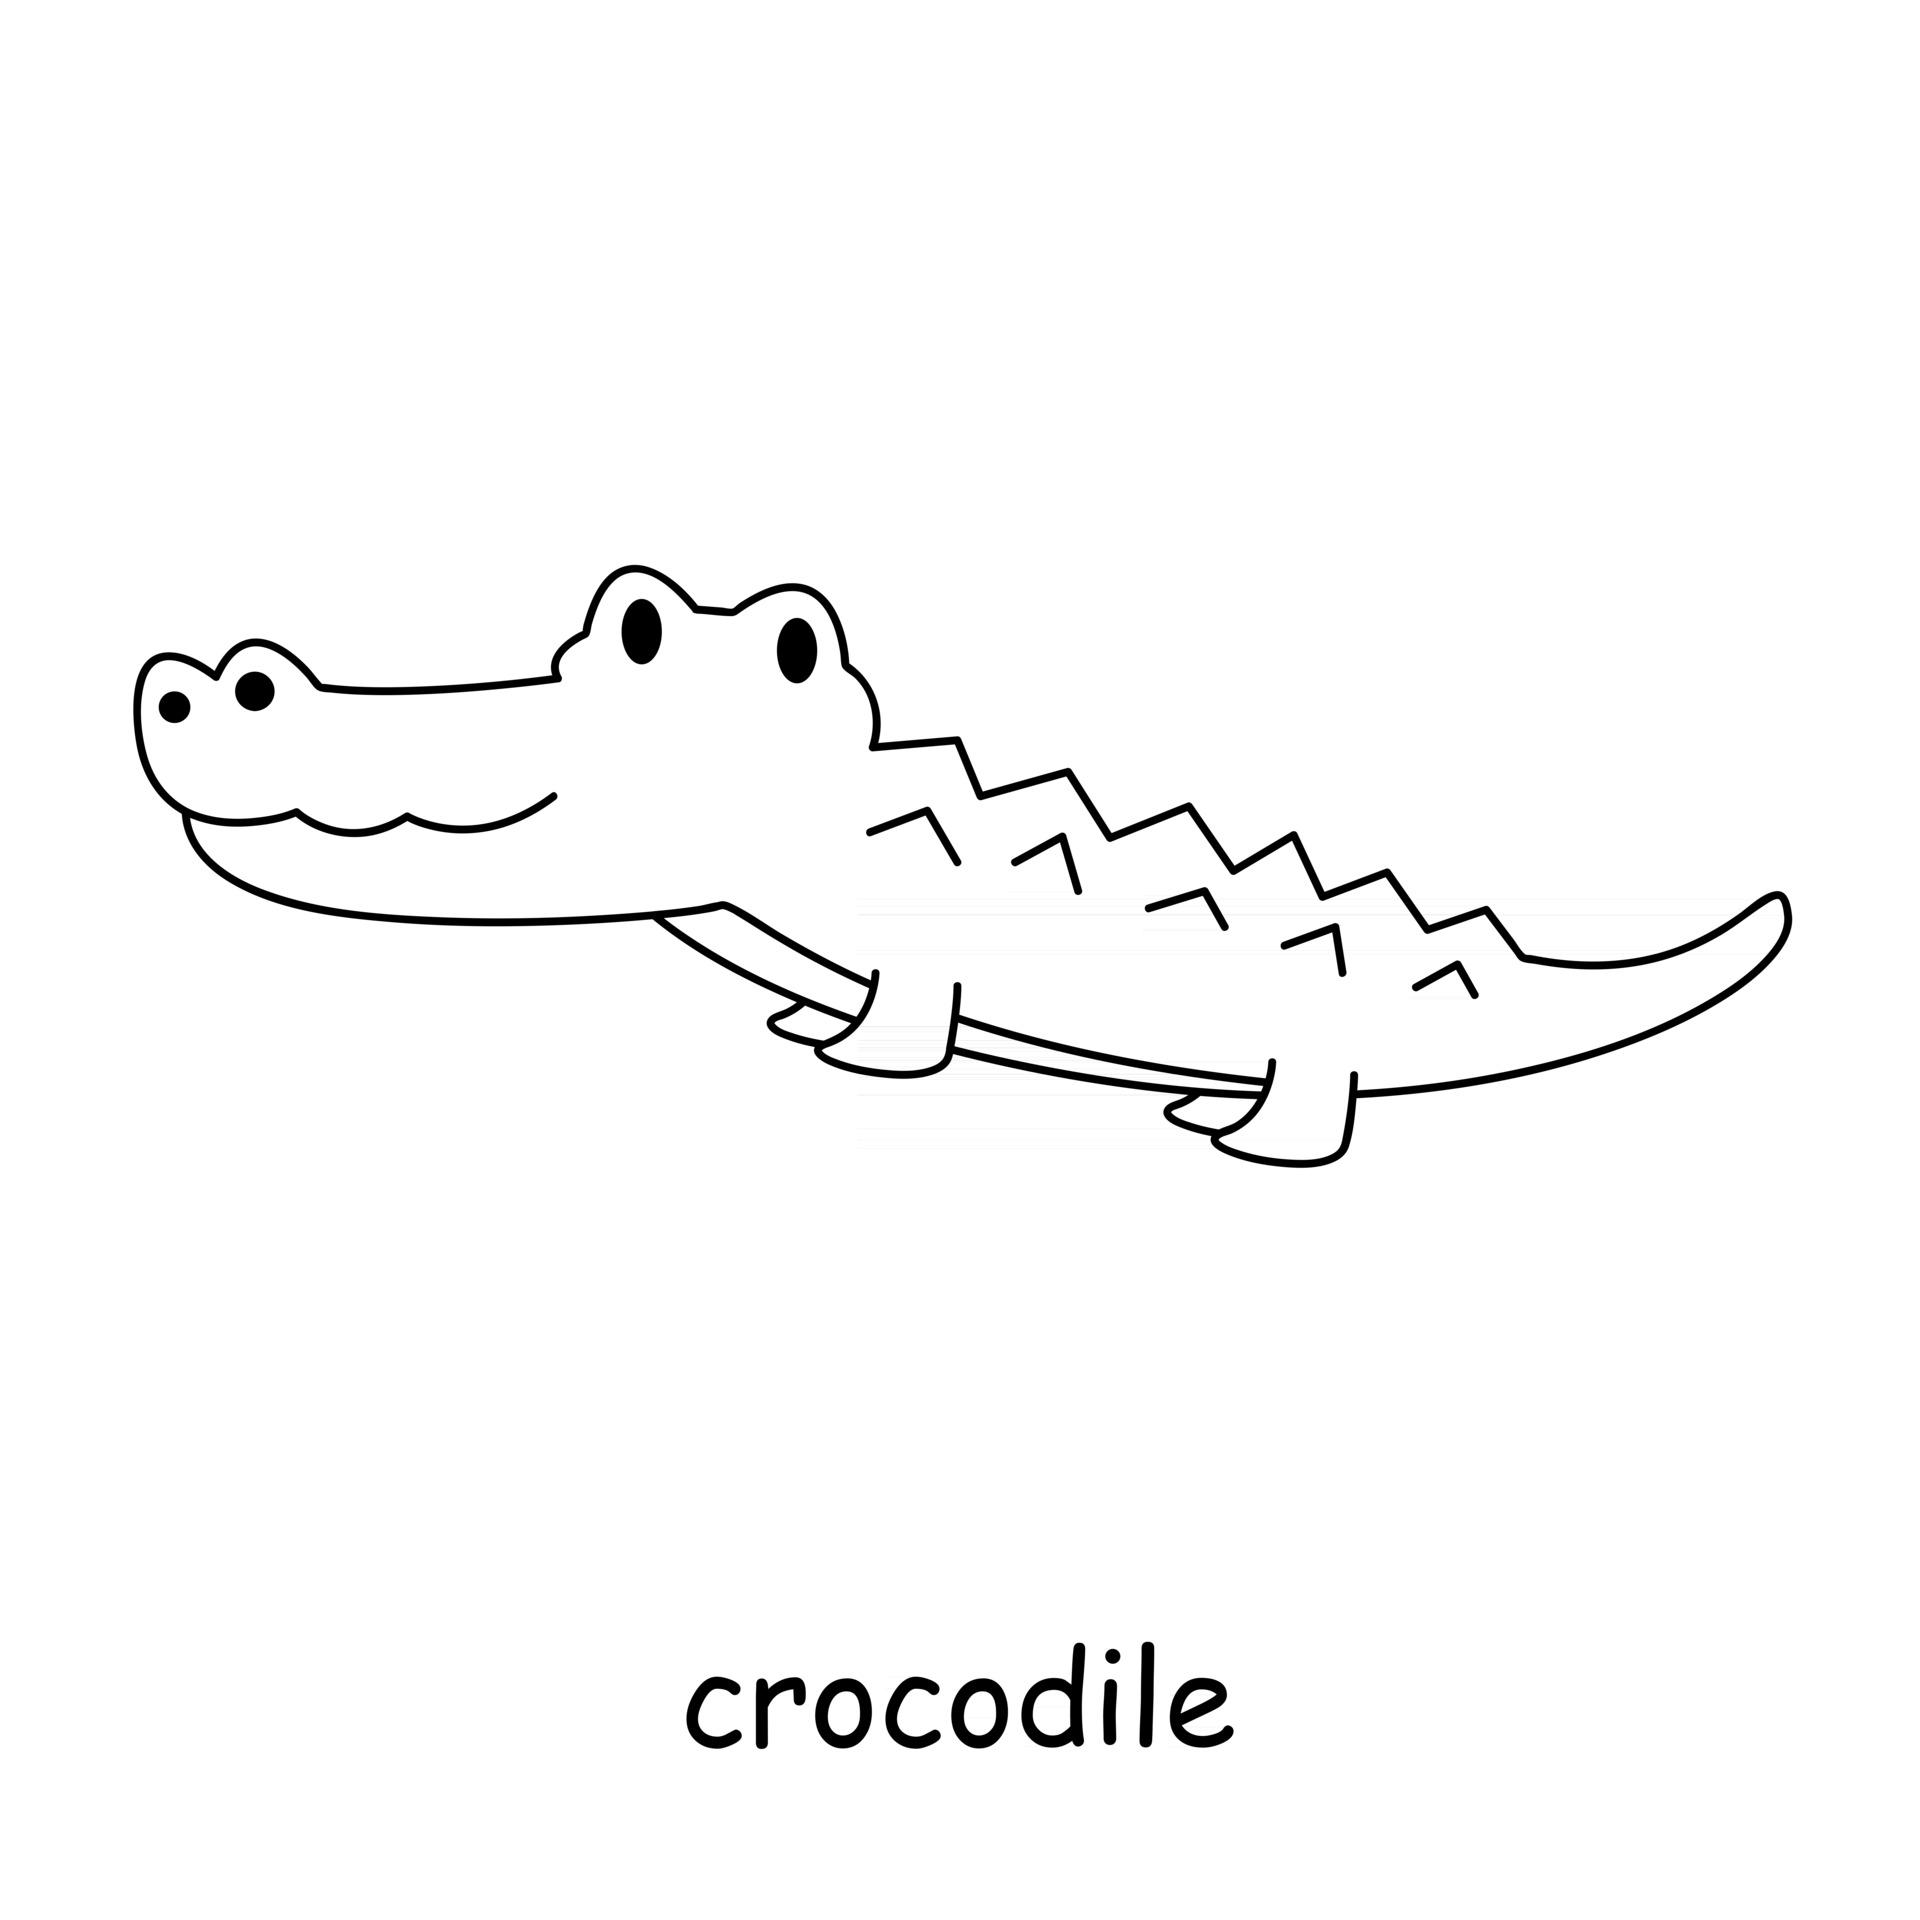 Kinder, die zum Thema Tiervektor, Krokodil färben 20 Vektor